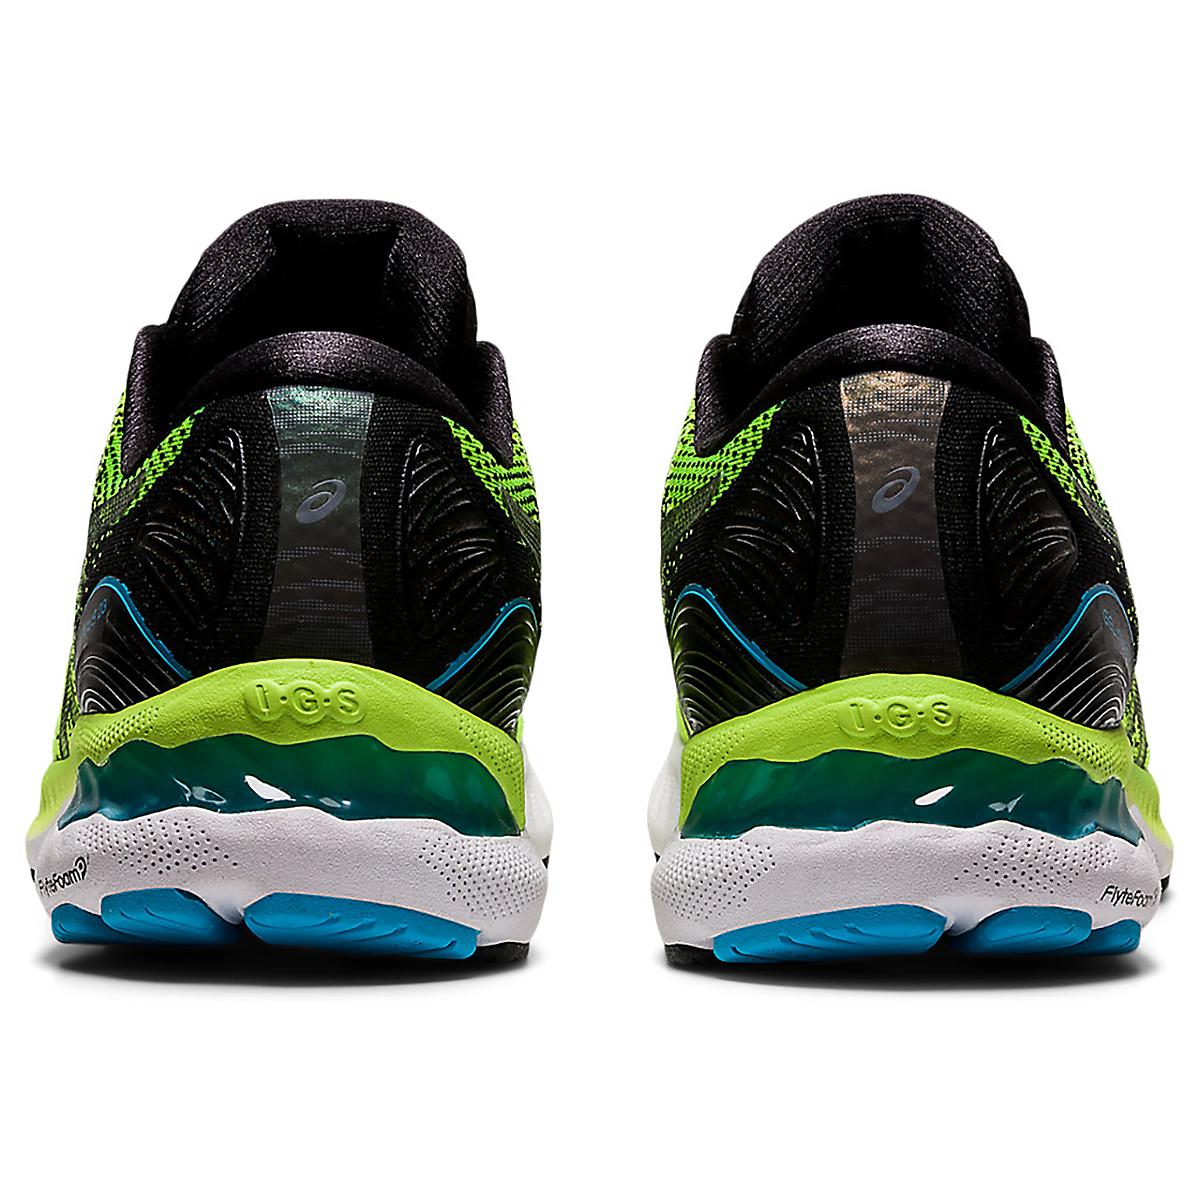 Men's Asics Gel-Nimbus 23 Running Shoe - Color: Hazard Green/Black - Size: 7 - Width: Regular, Hazard Green/Black, large, image 6